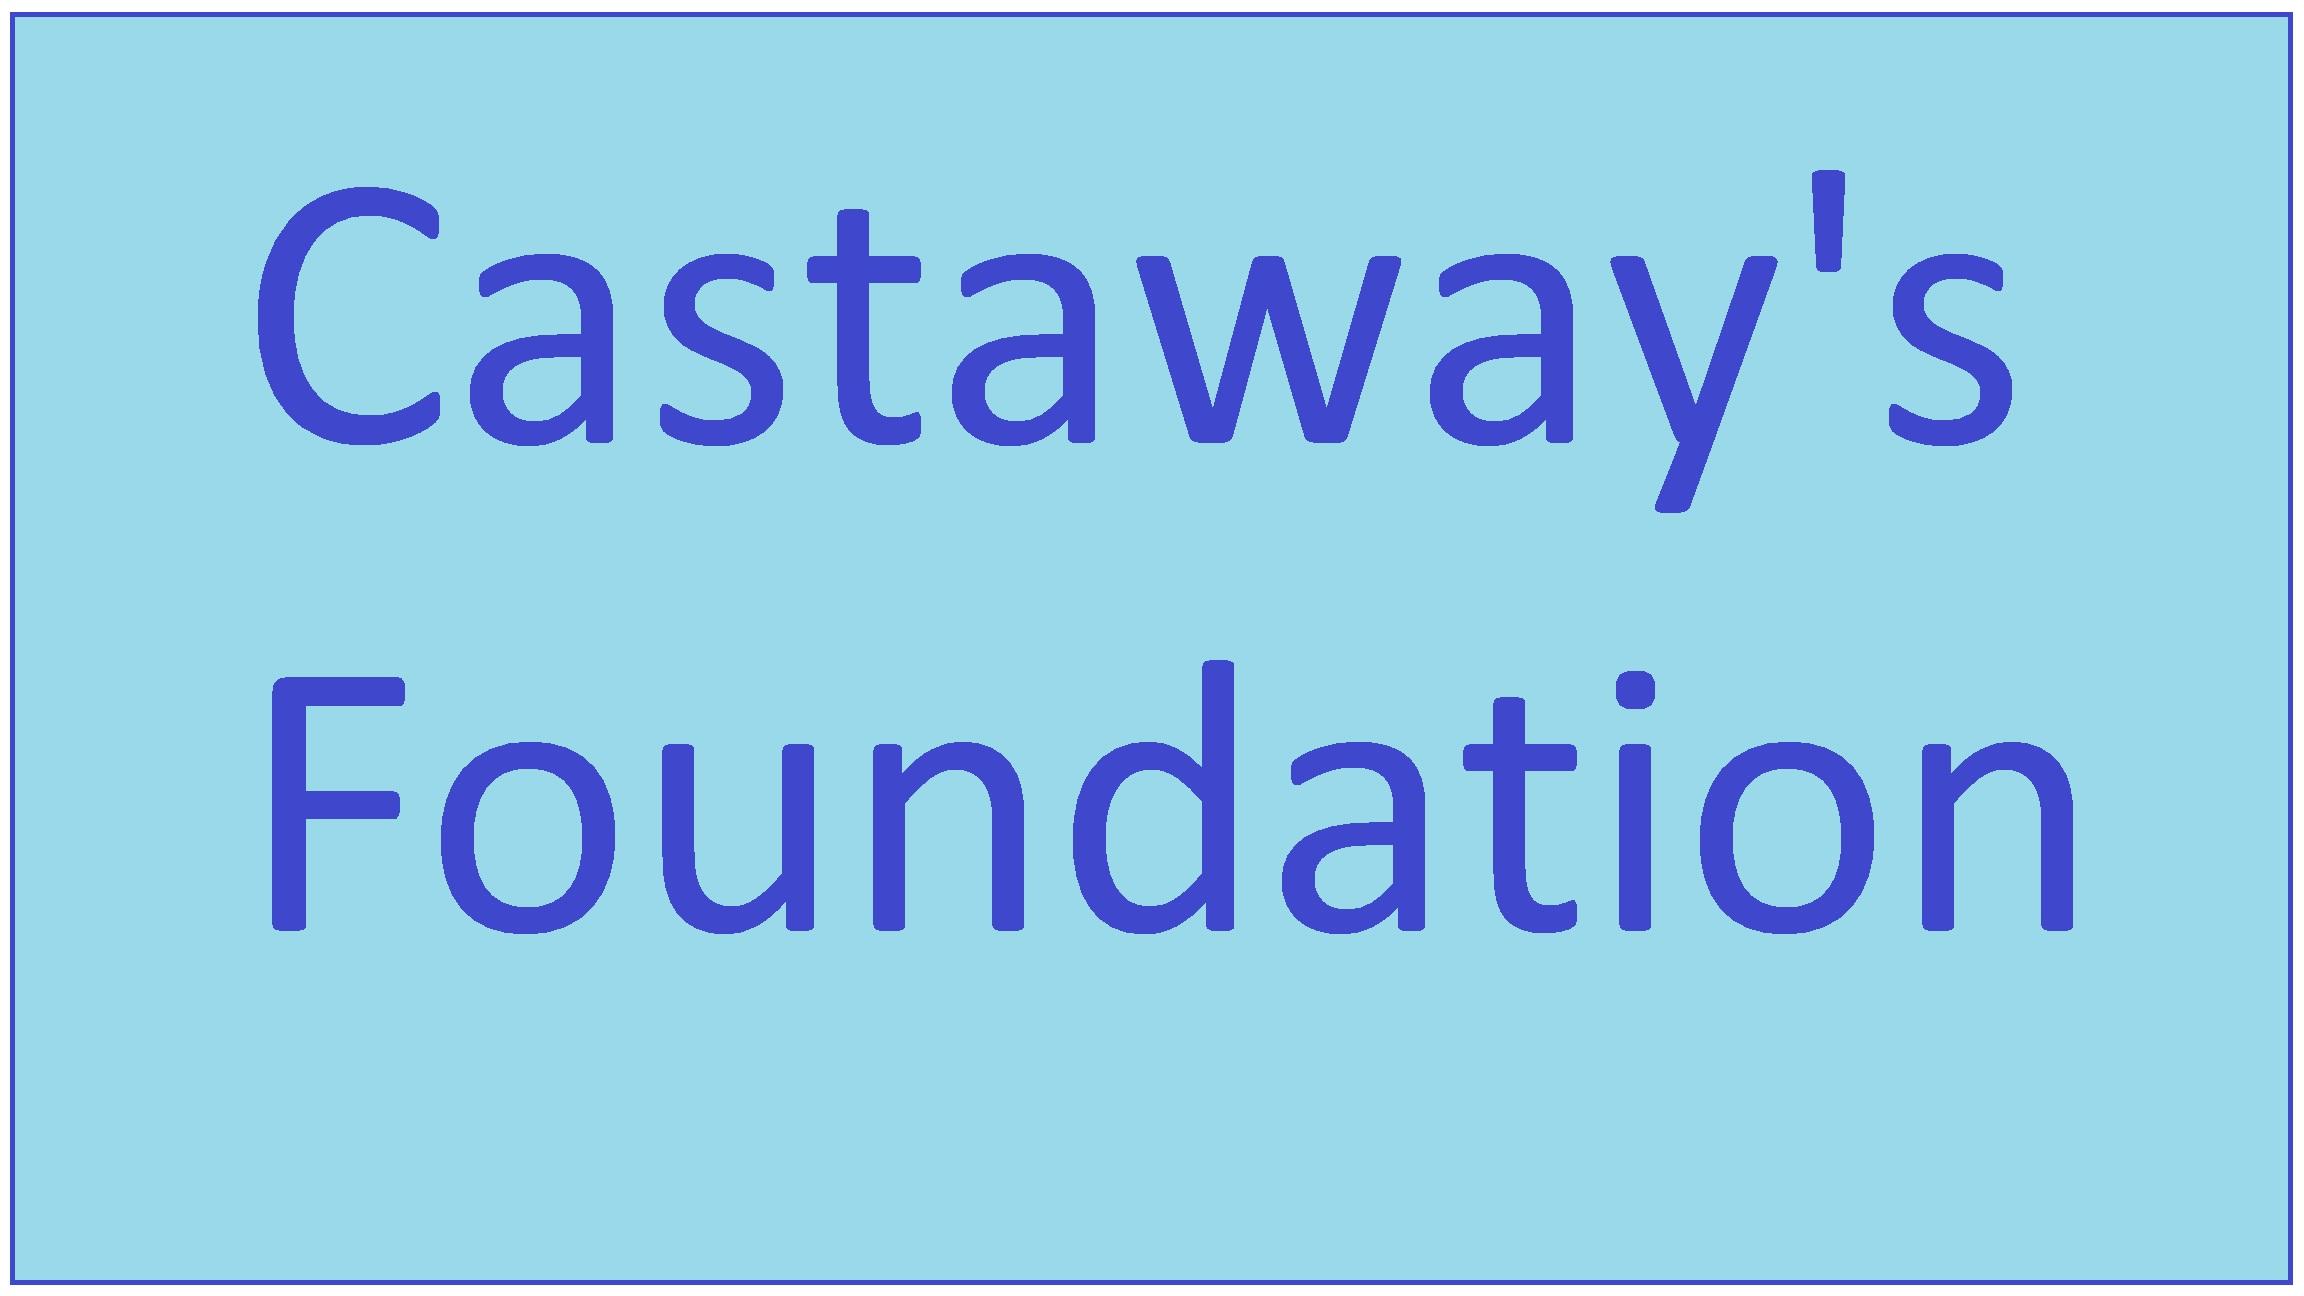 Castaway's Foundation